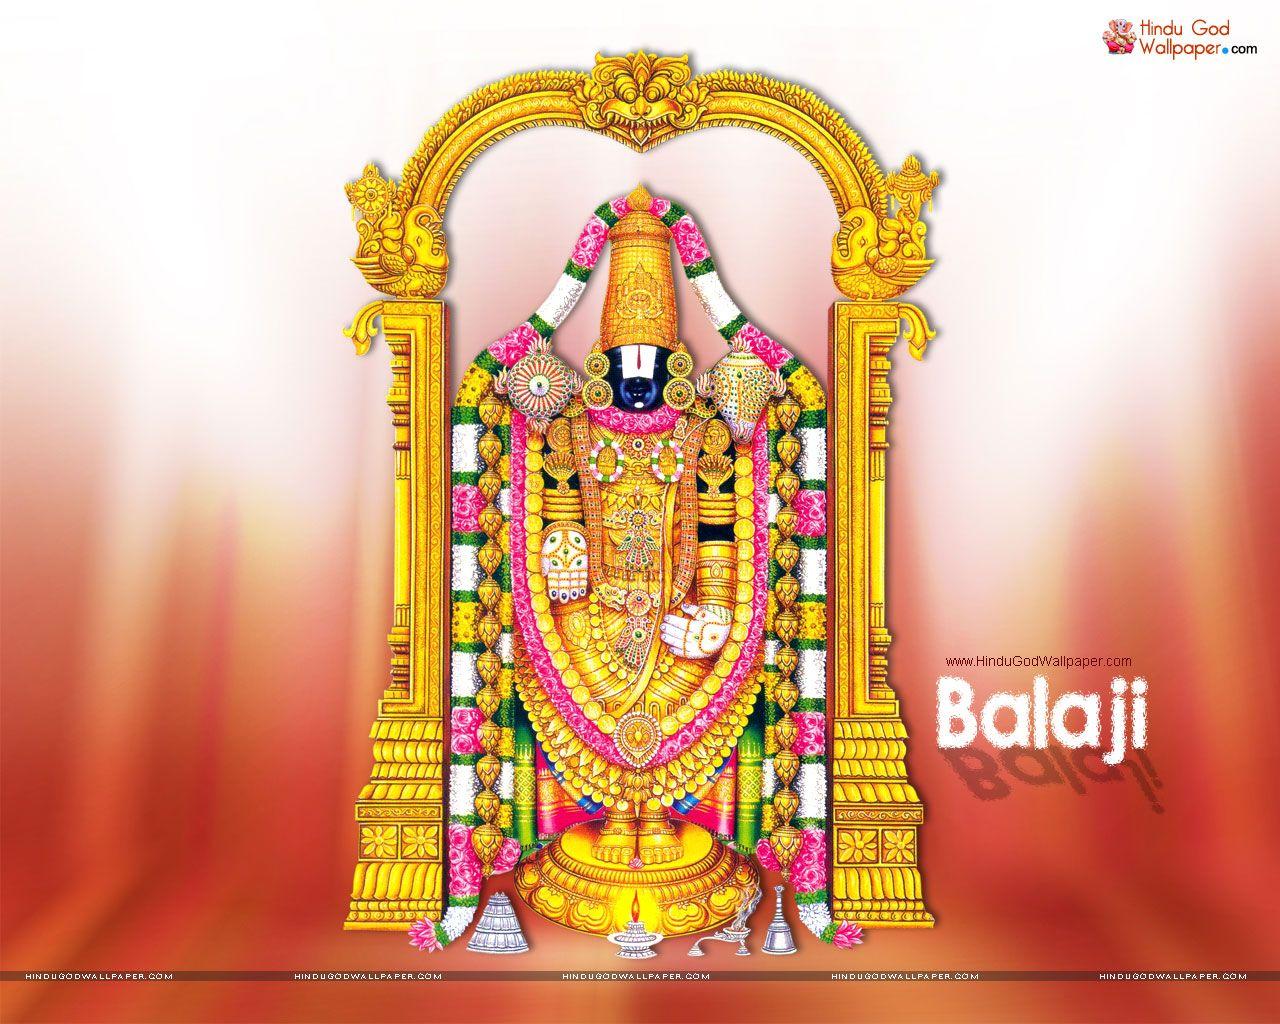 Cool Wallpaper Lord Balaji - 4efaeac01445b2e5c961a04649a0c041  Pictures_68482.jpg